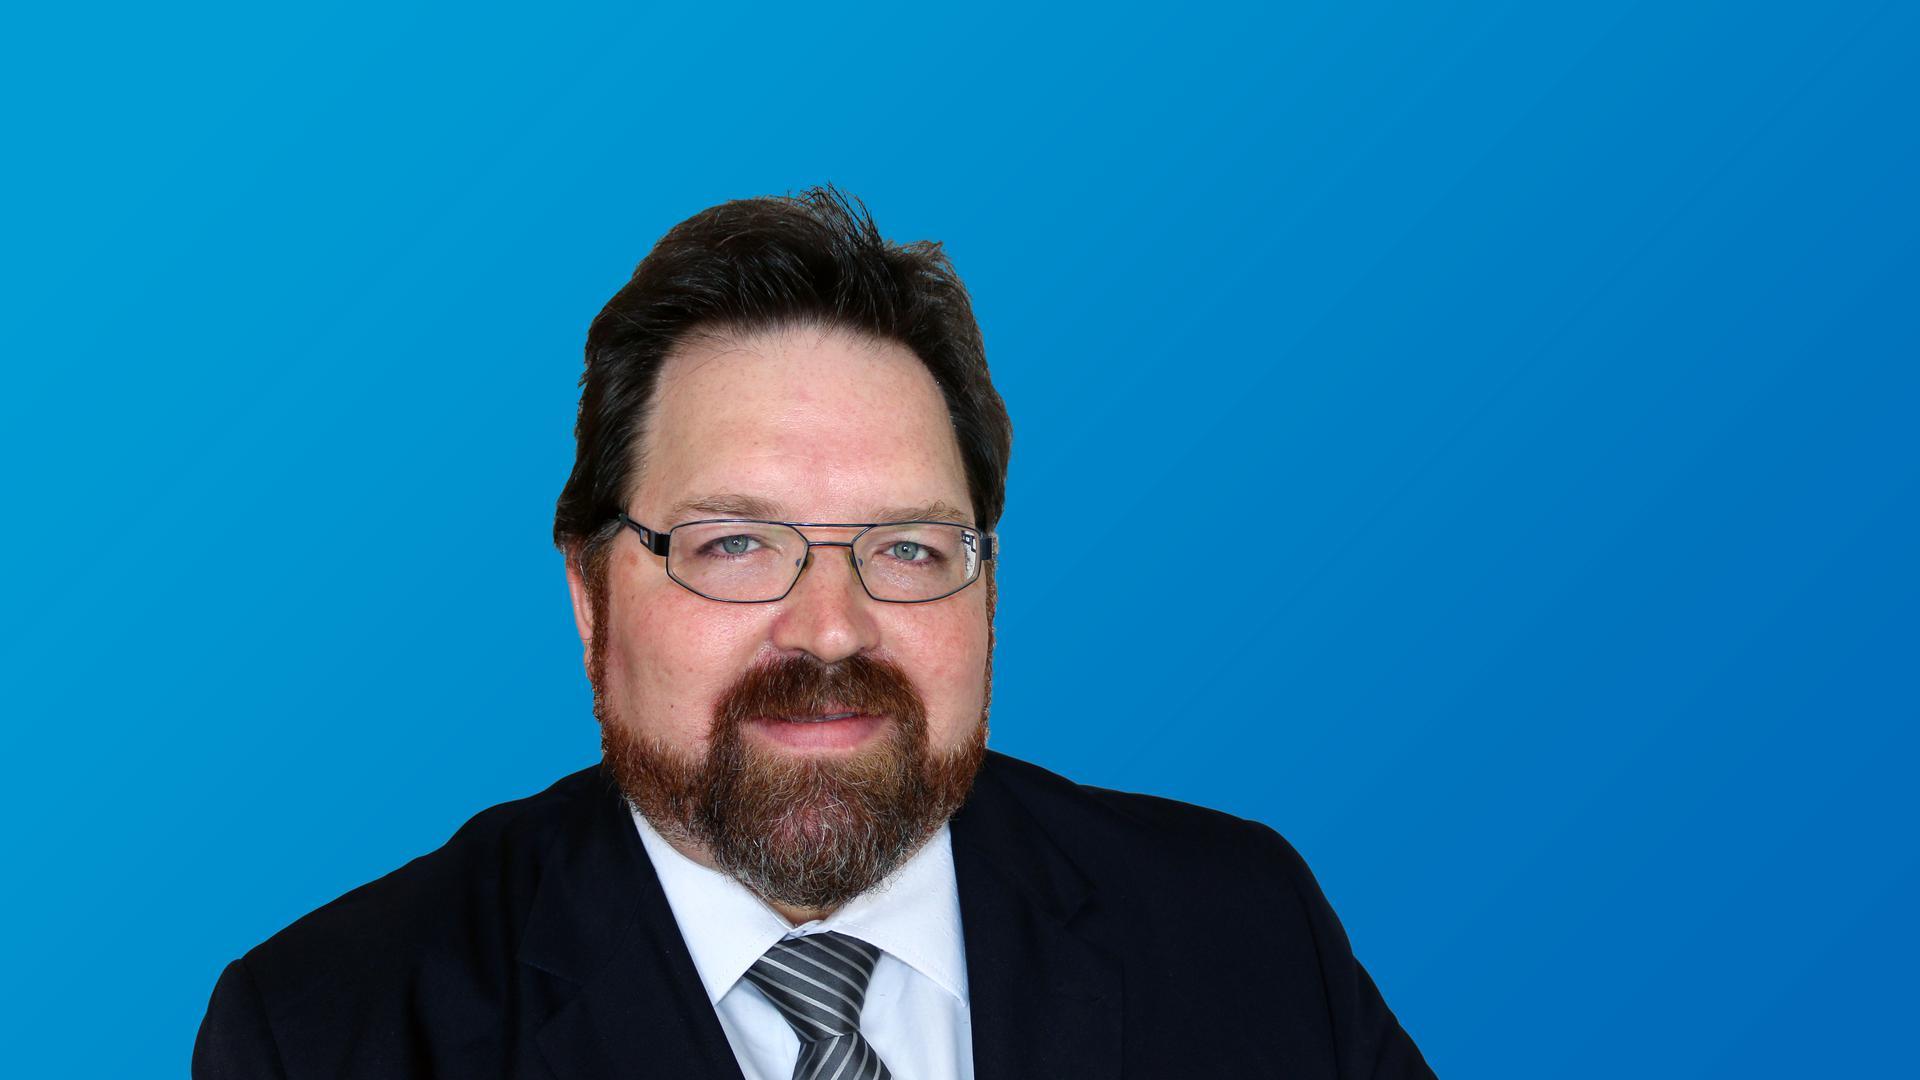 Rene Rotzinger, AfD-Bundestagkandidat für den Wahlkreis Karlsruhe-Land